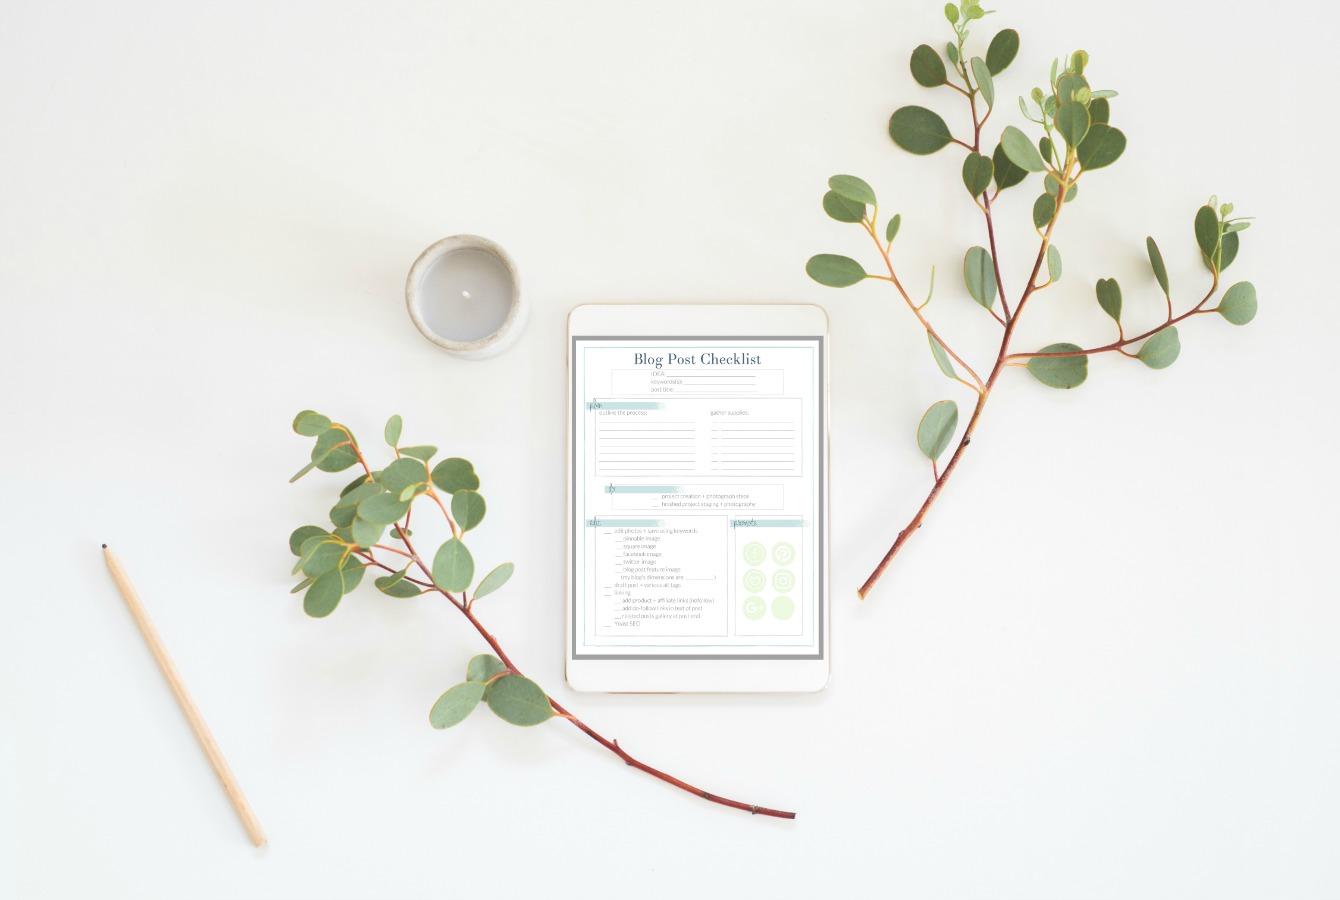 Blog Post Checklist (a free printable)